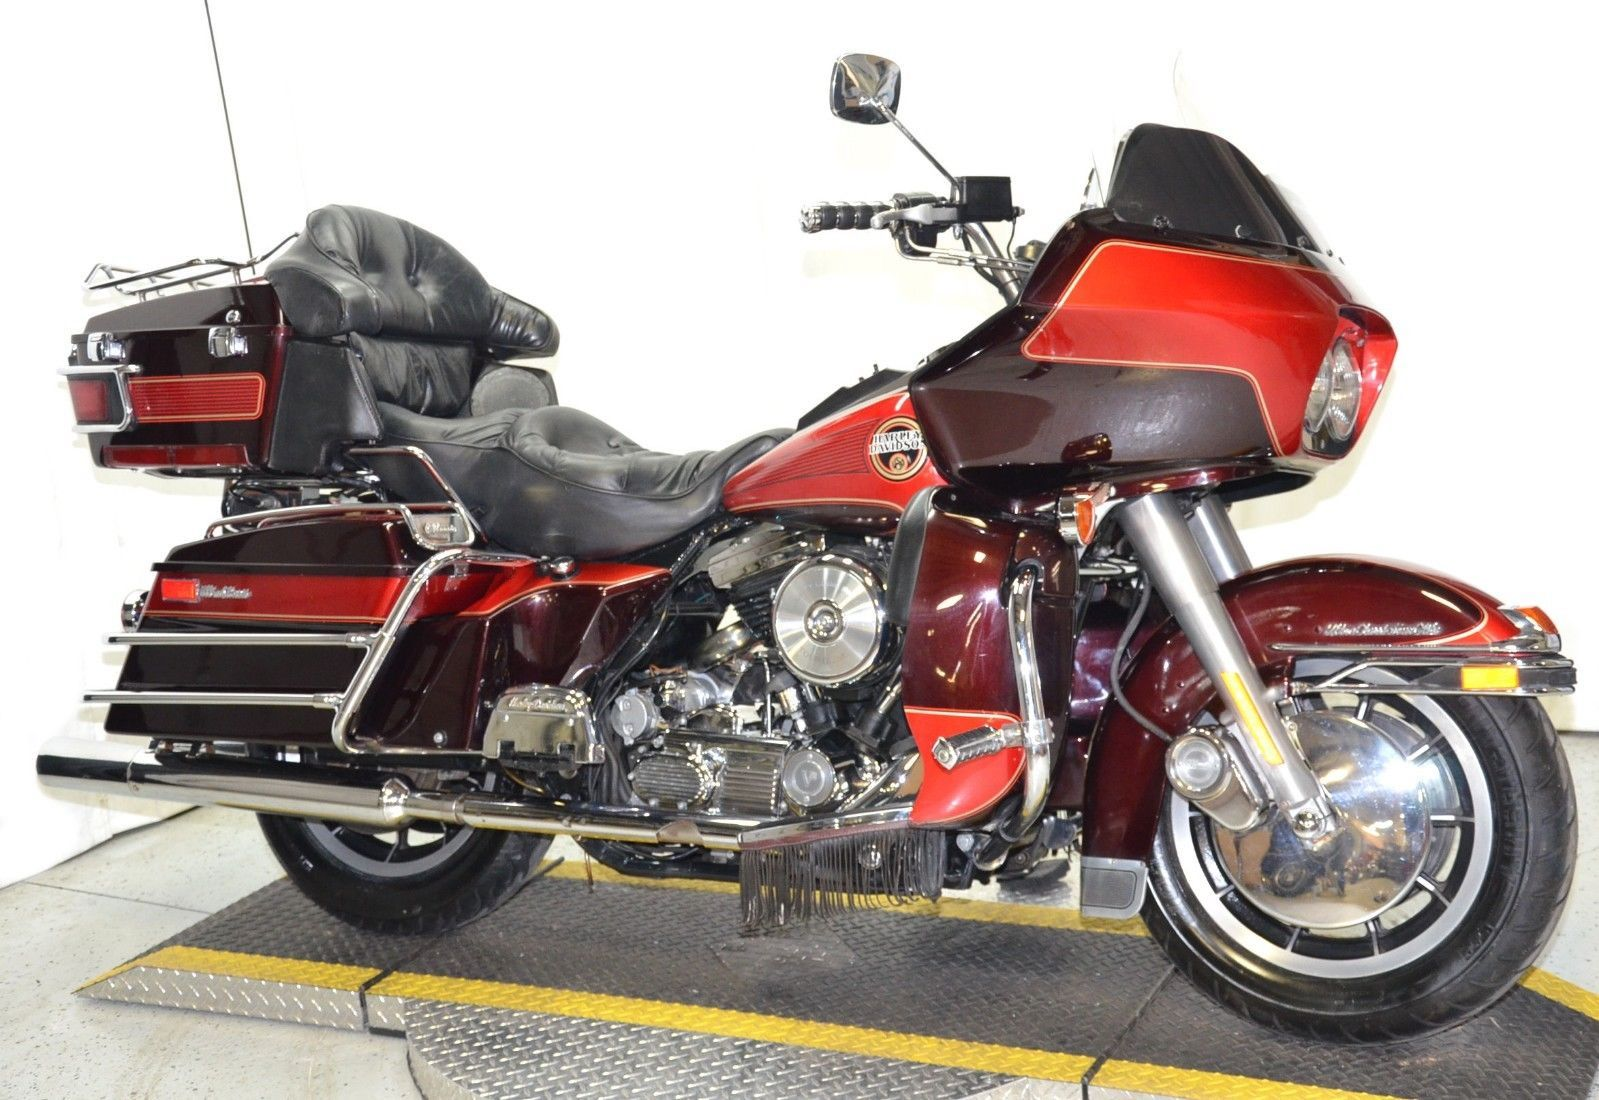 1990 Harley Davidson Touring Harley Davidson Painting Harley Davidson Touring Harley Davidson [ 1100 x 1599 Pixel ]